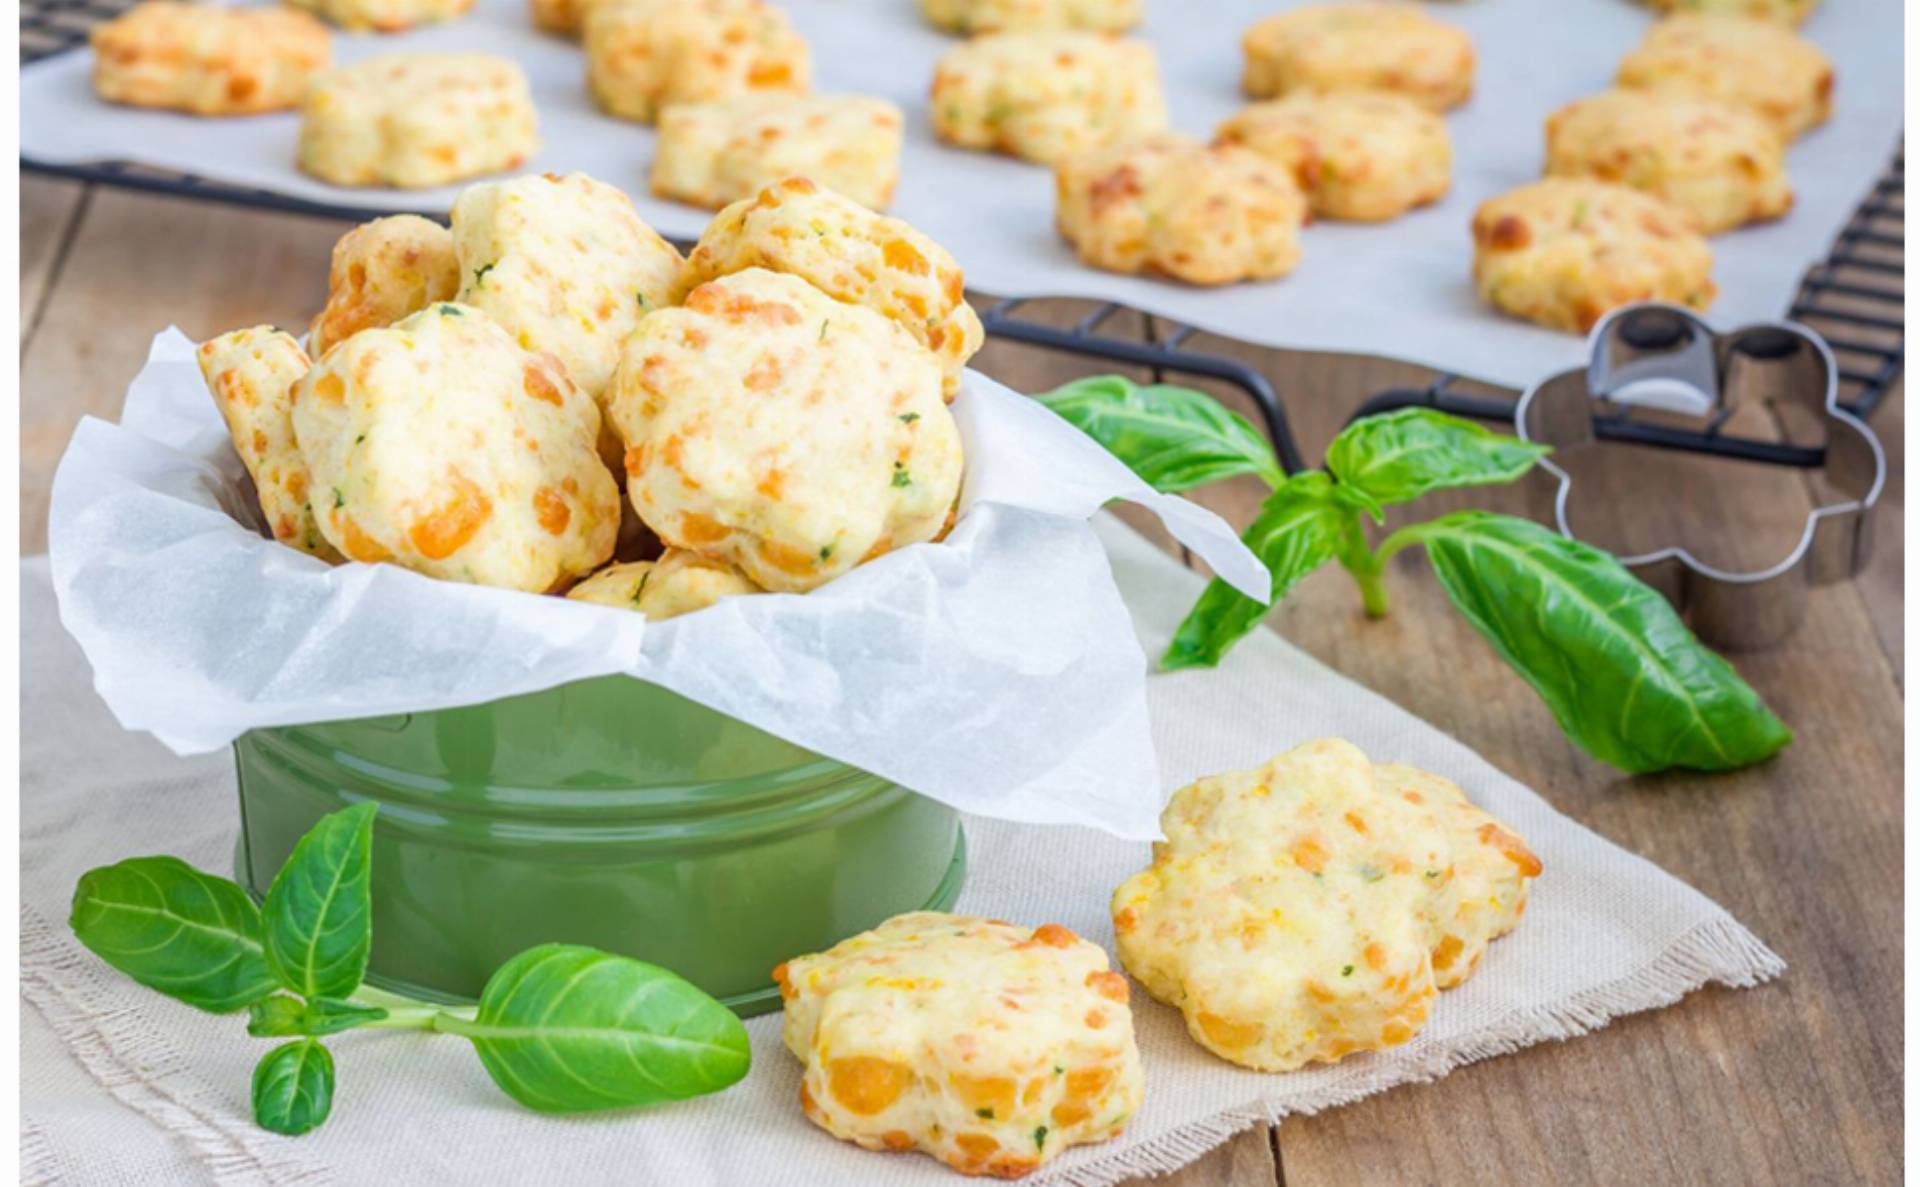 Przepis na kruche ciasteczka serowe